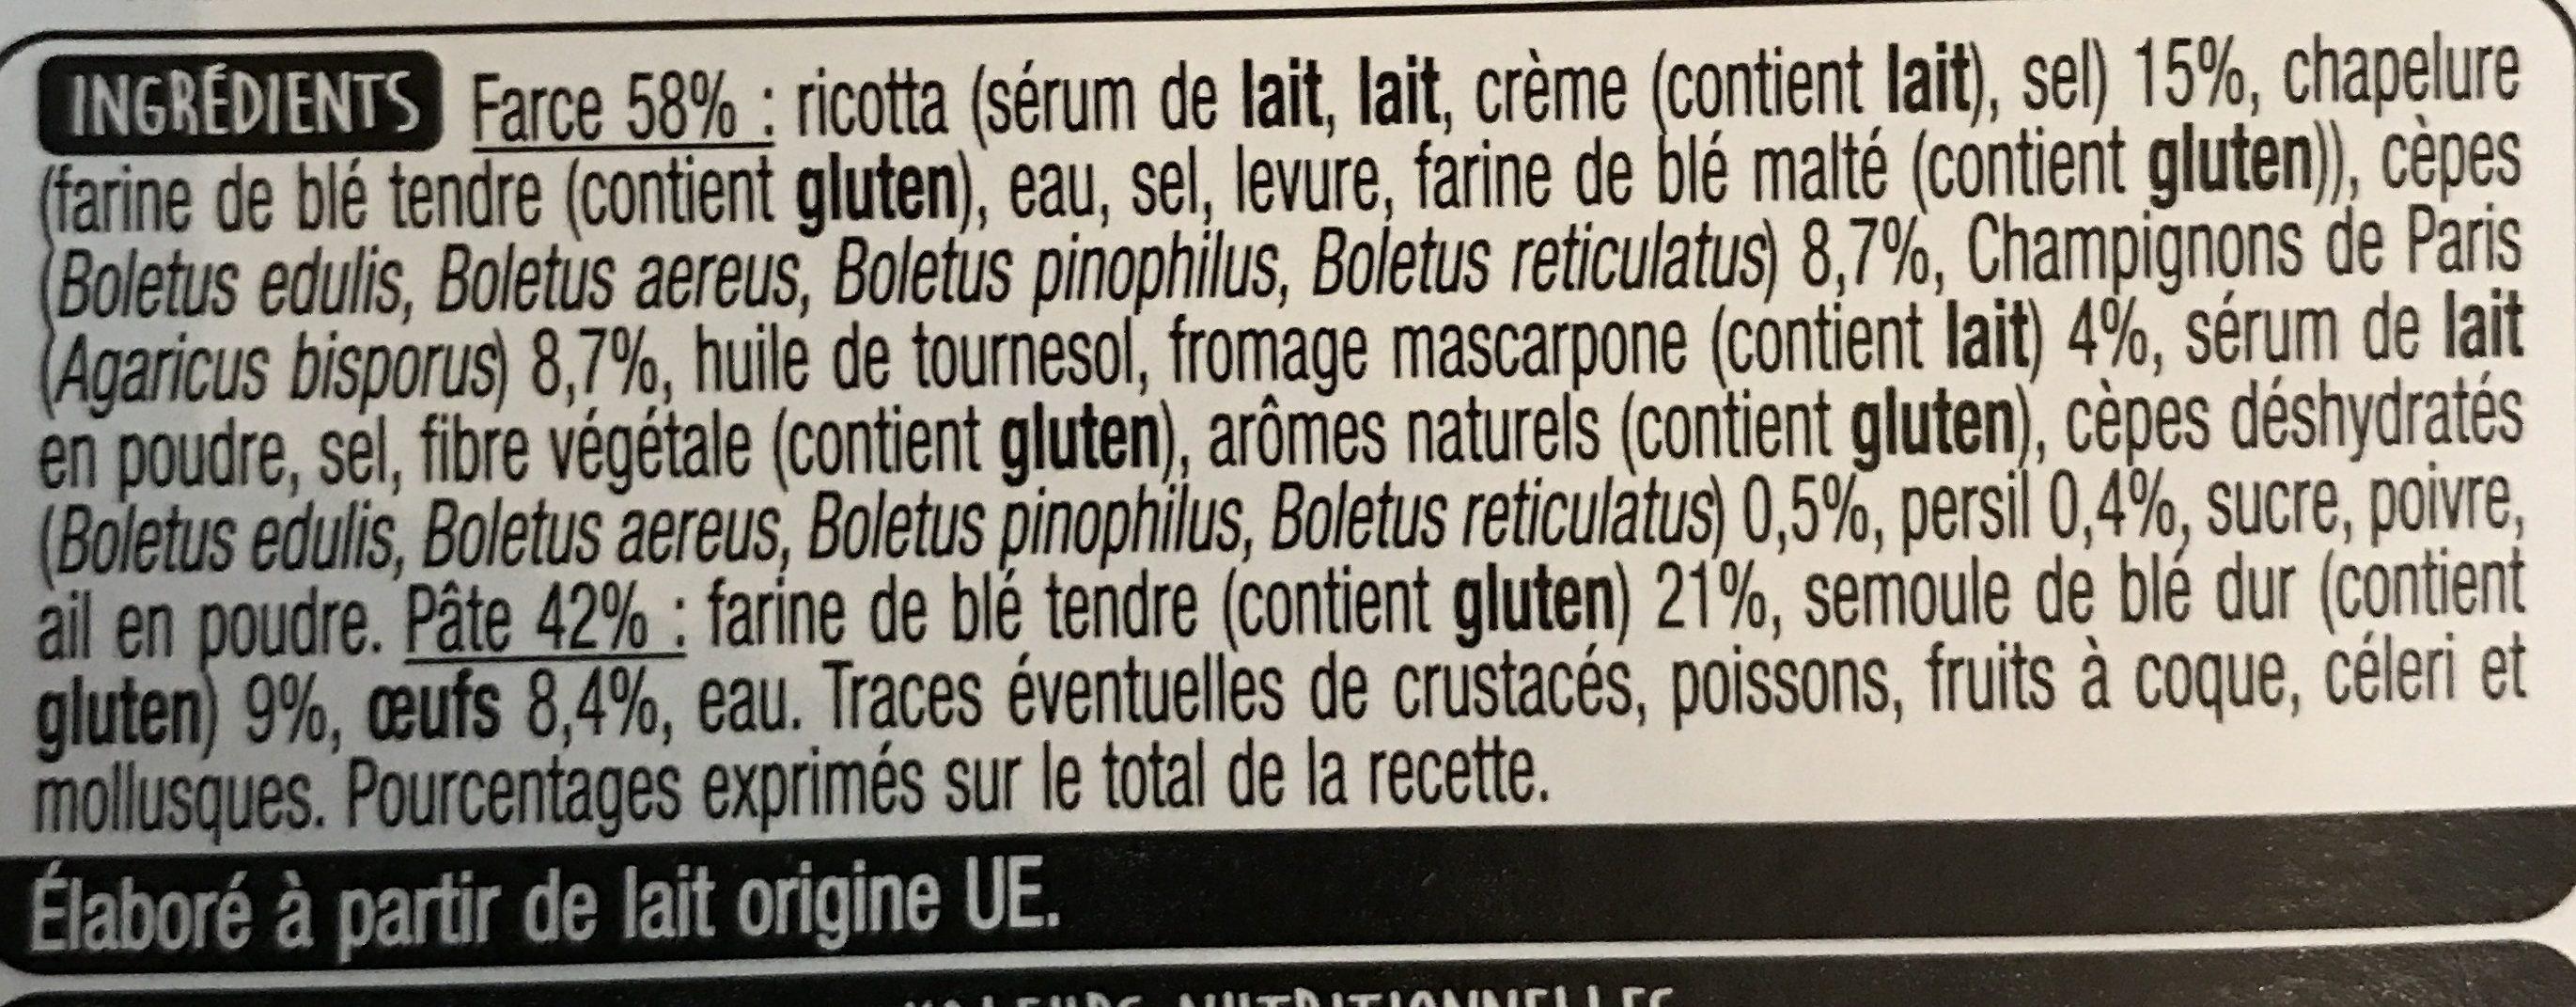 Girasole Champignons Mascarpone - Ingredients - fr